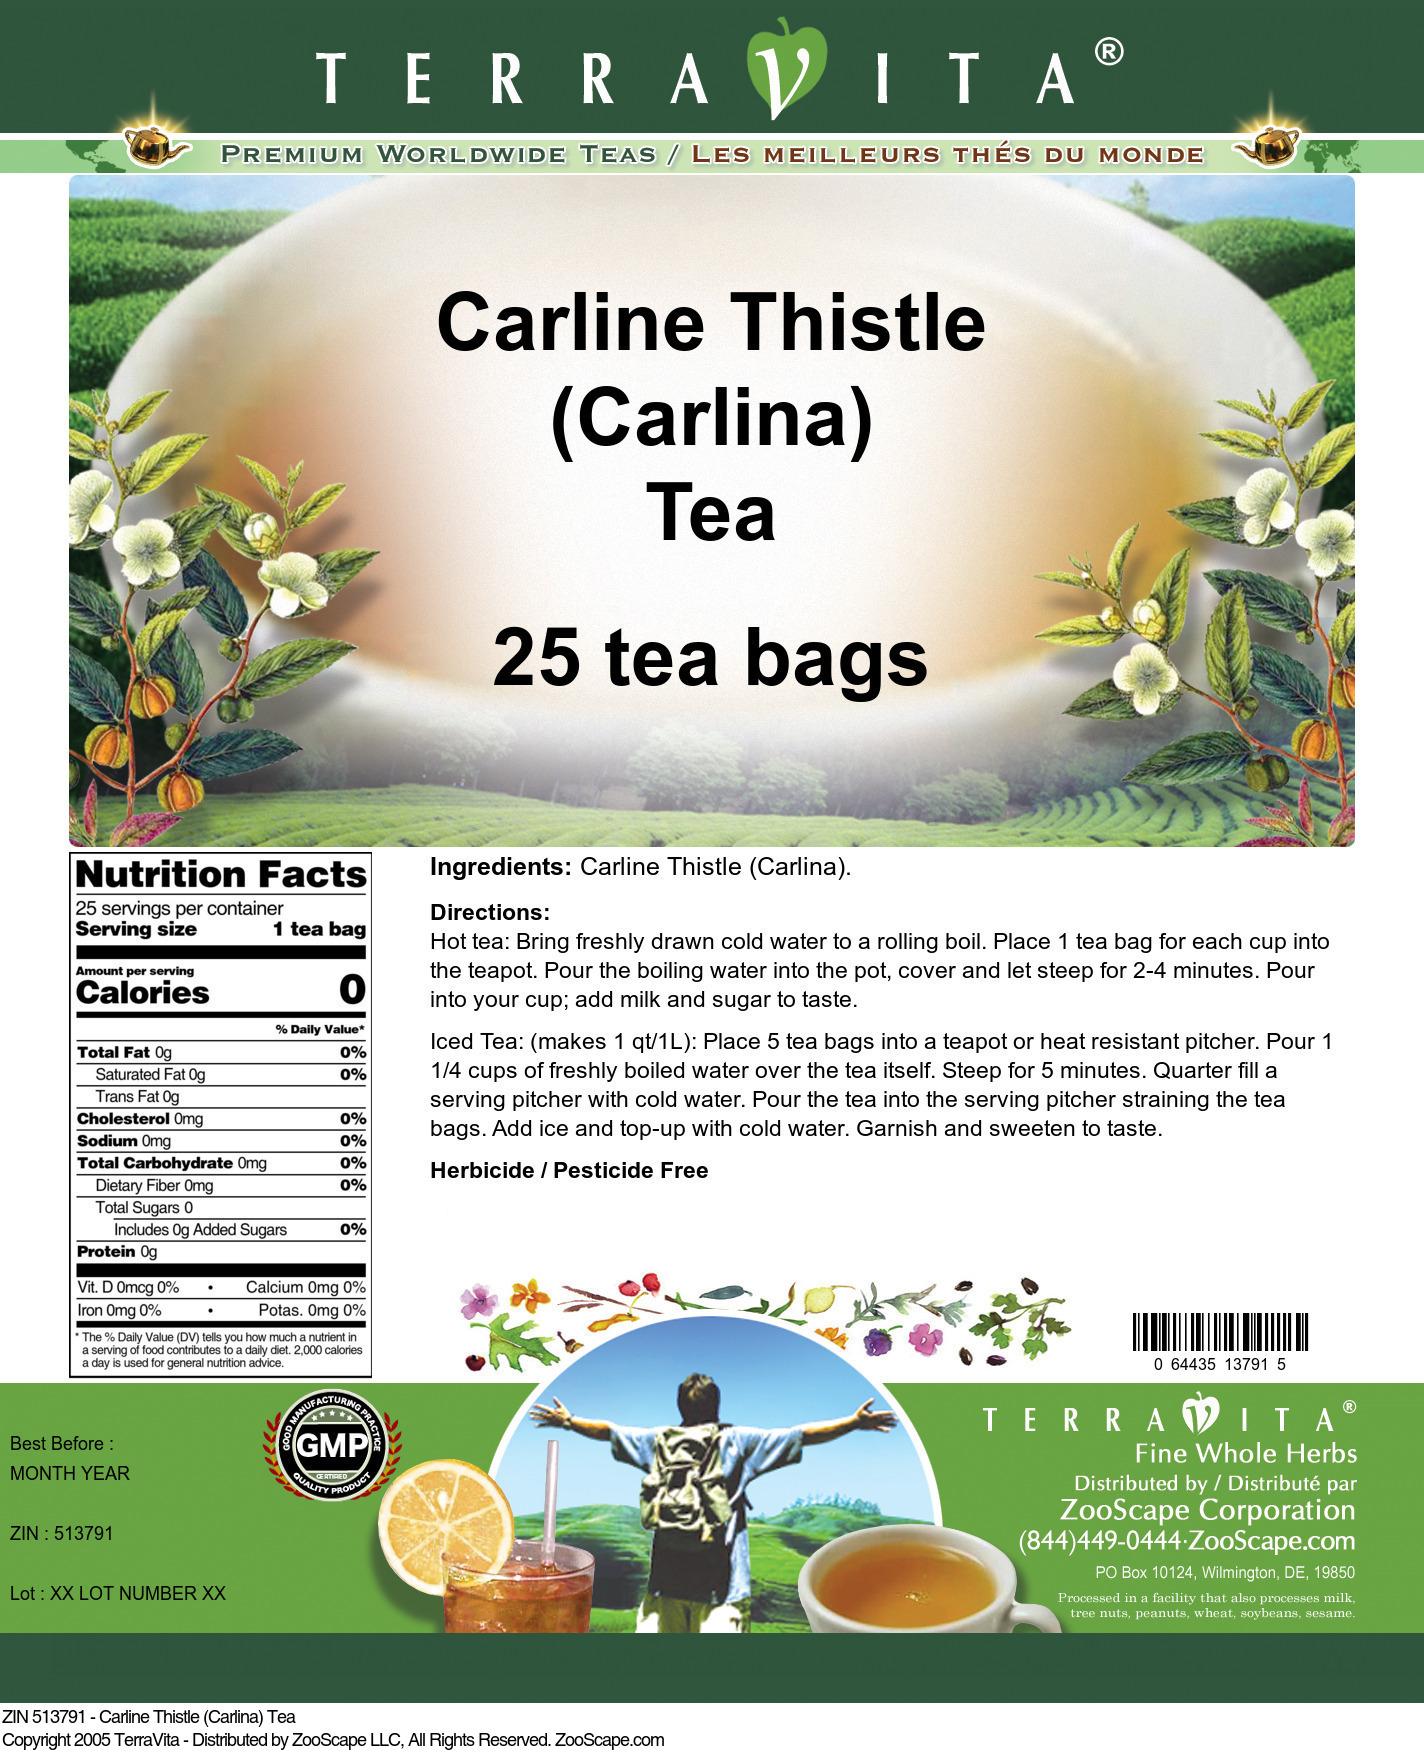 Carline Thistle (Carlina) Tea